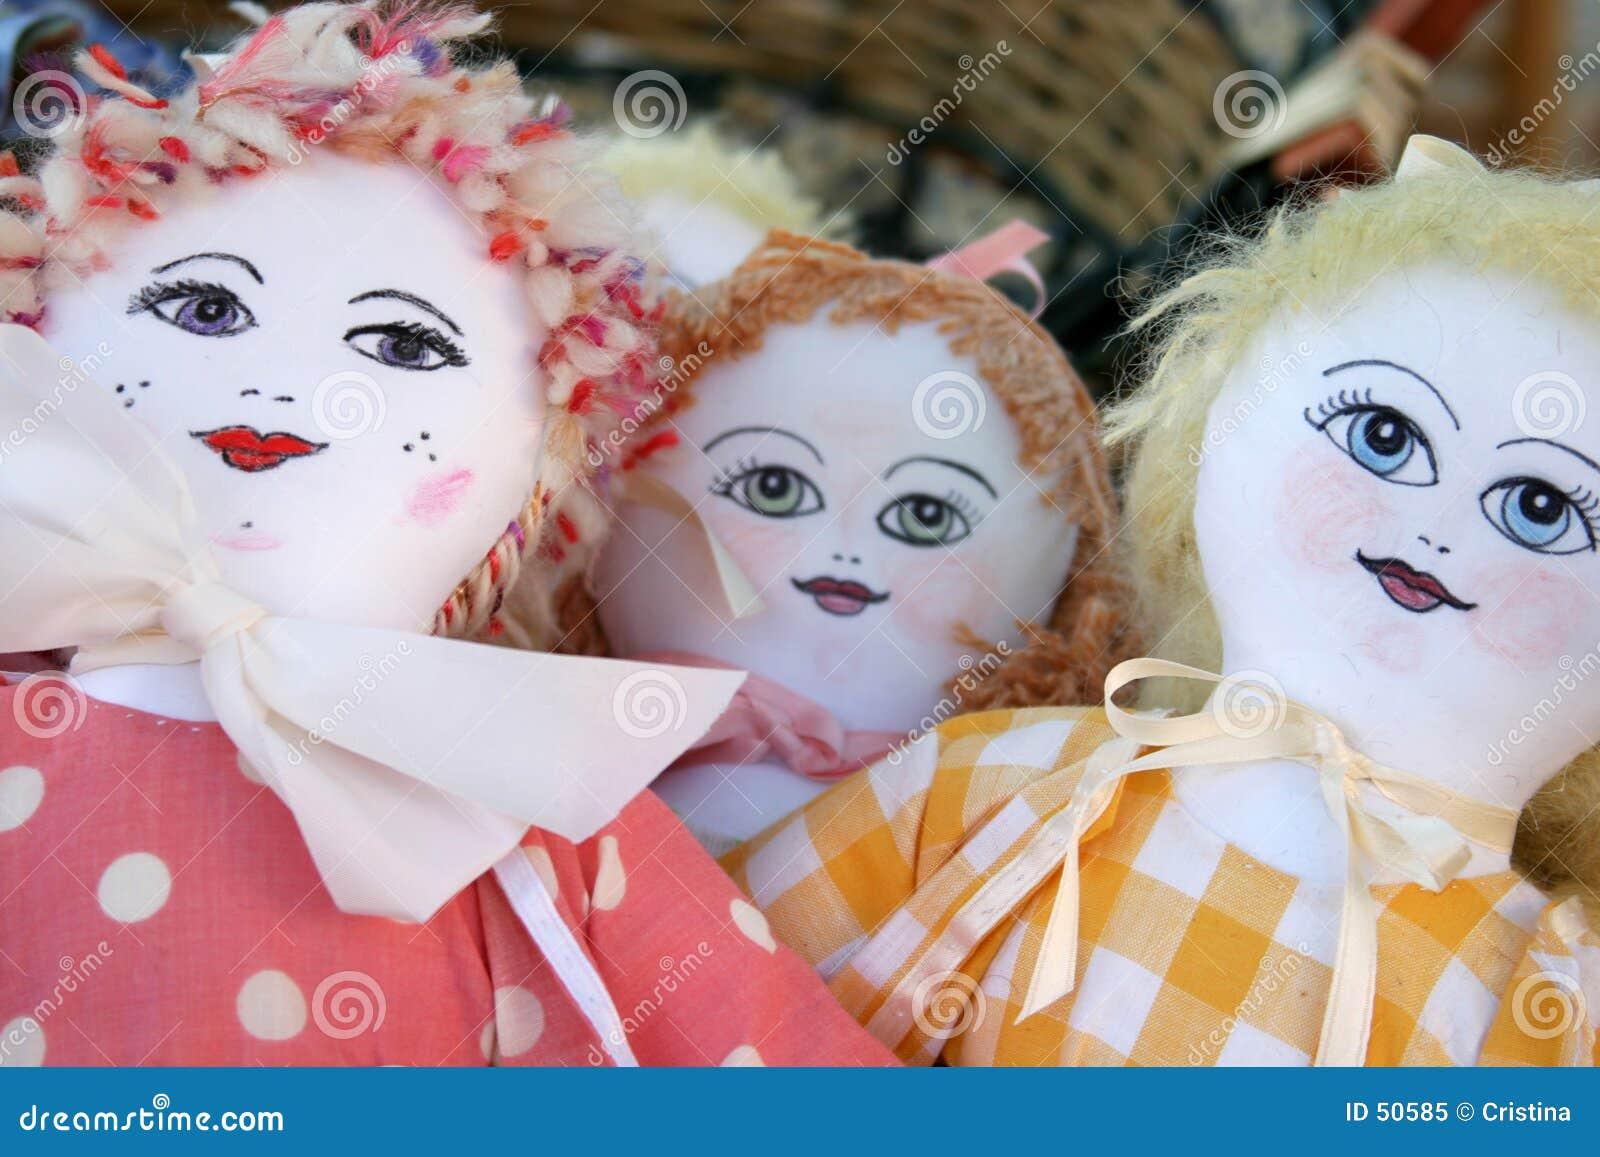 Dolls in a basket